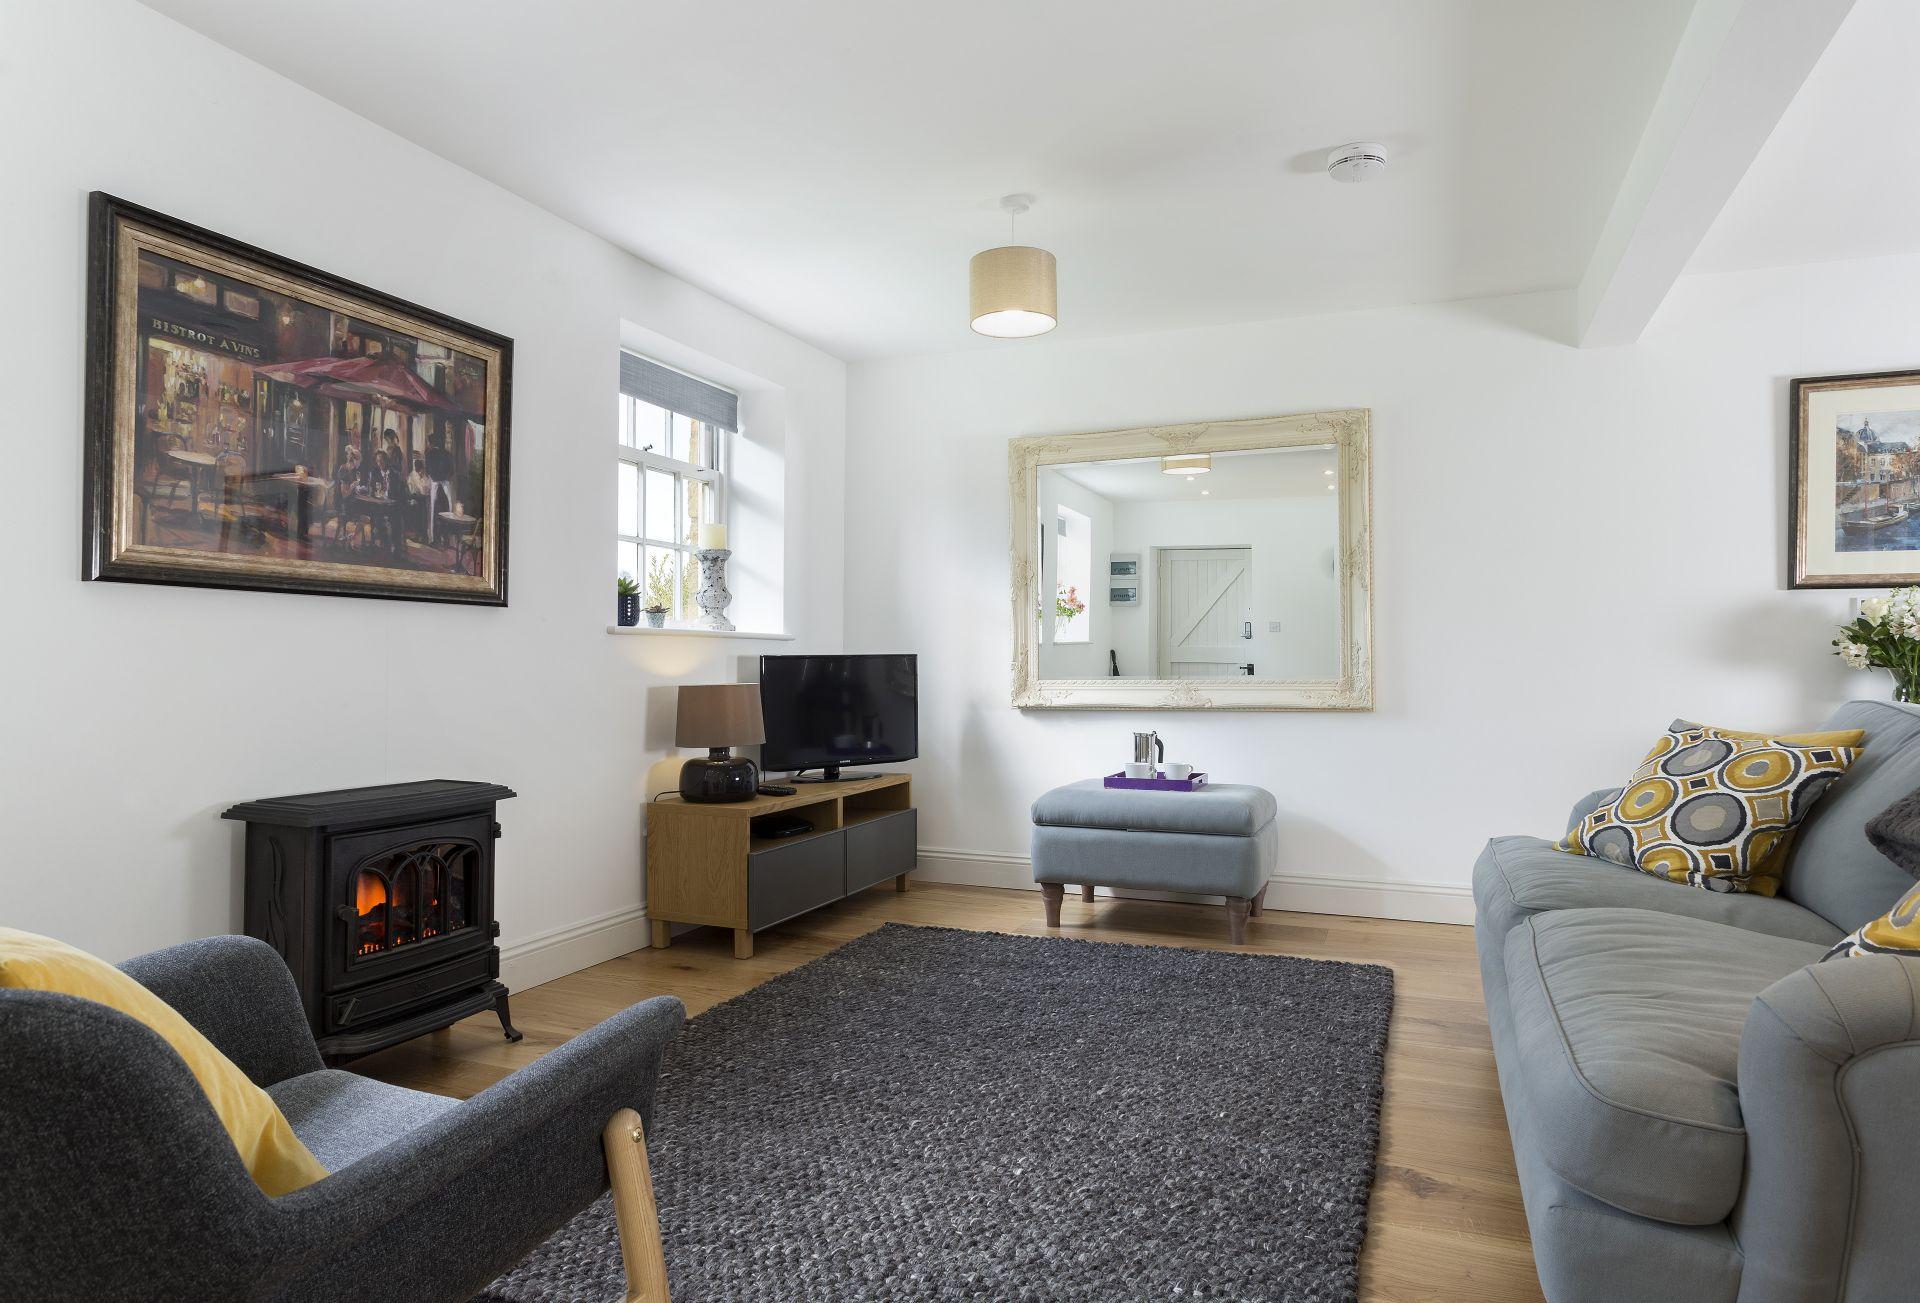 Ground floor: Living area